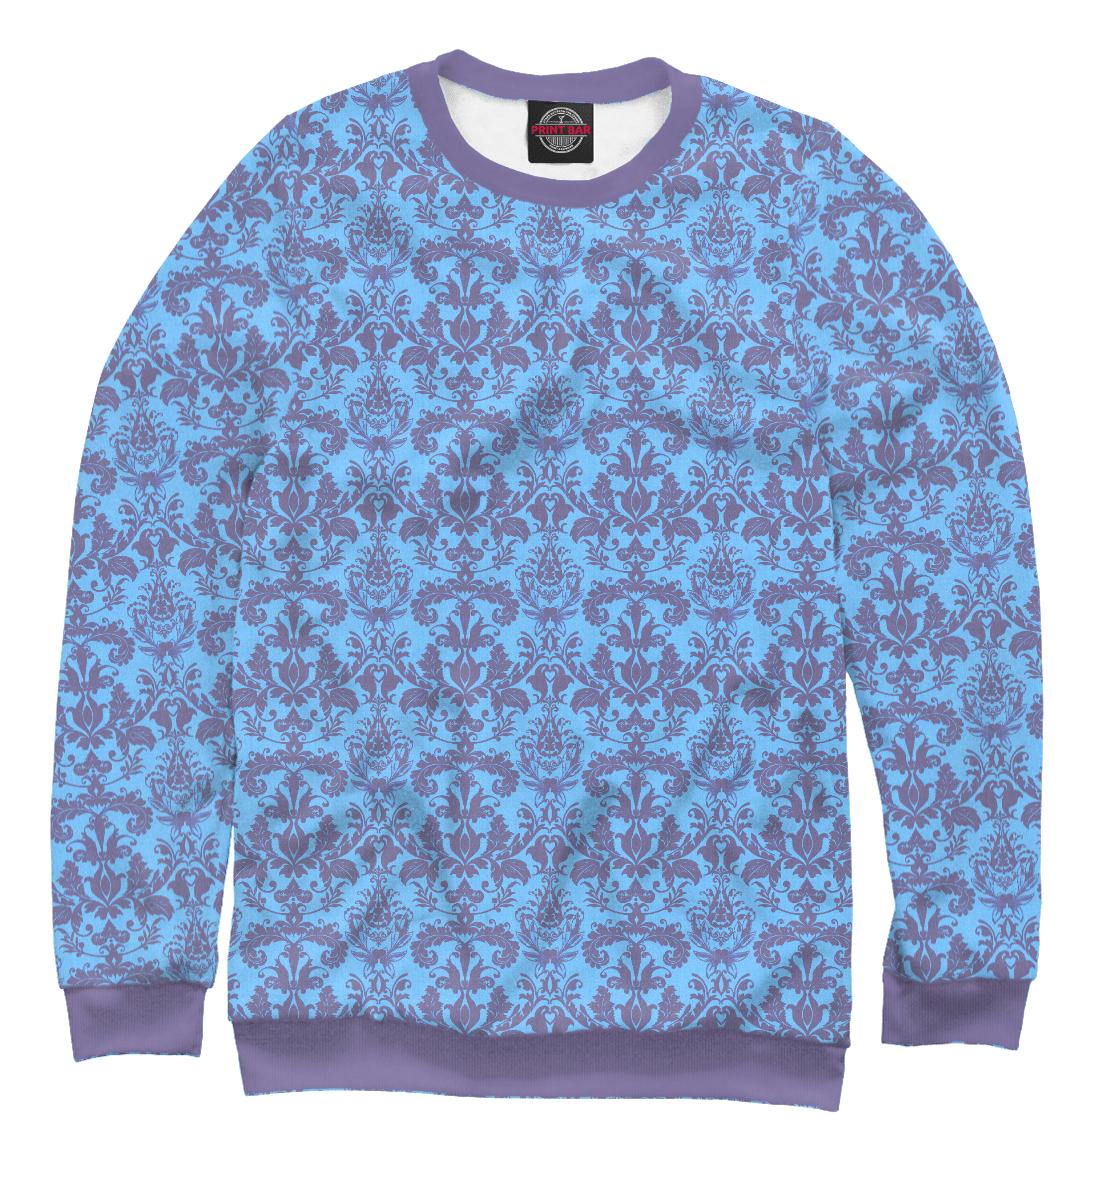 Купить Damask Blue Rasberry, Printbar, Свитшоты, ABS-362521-swi-2